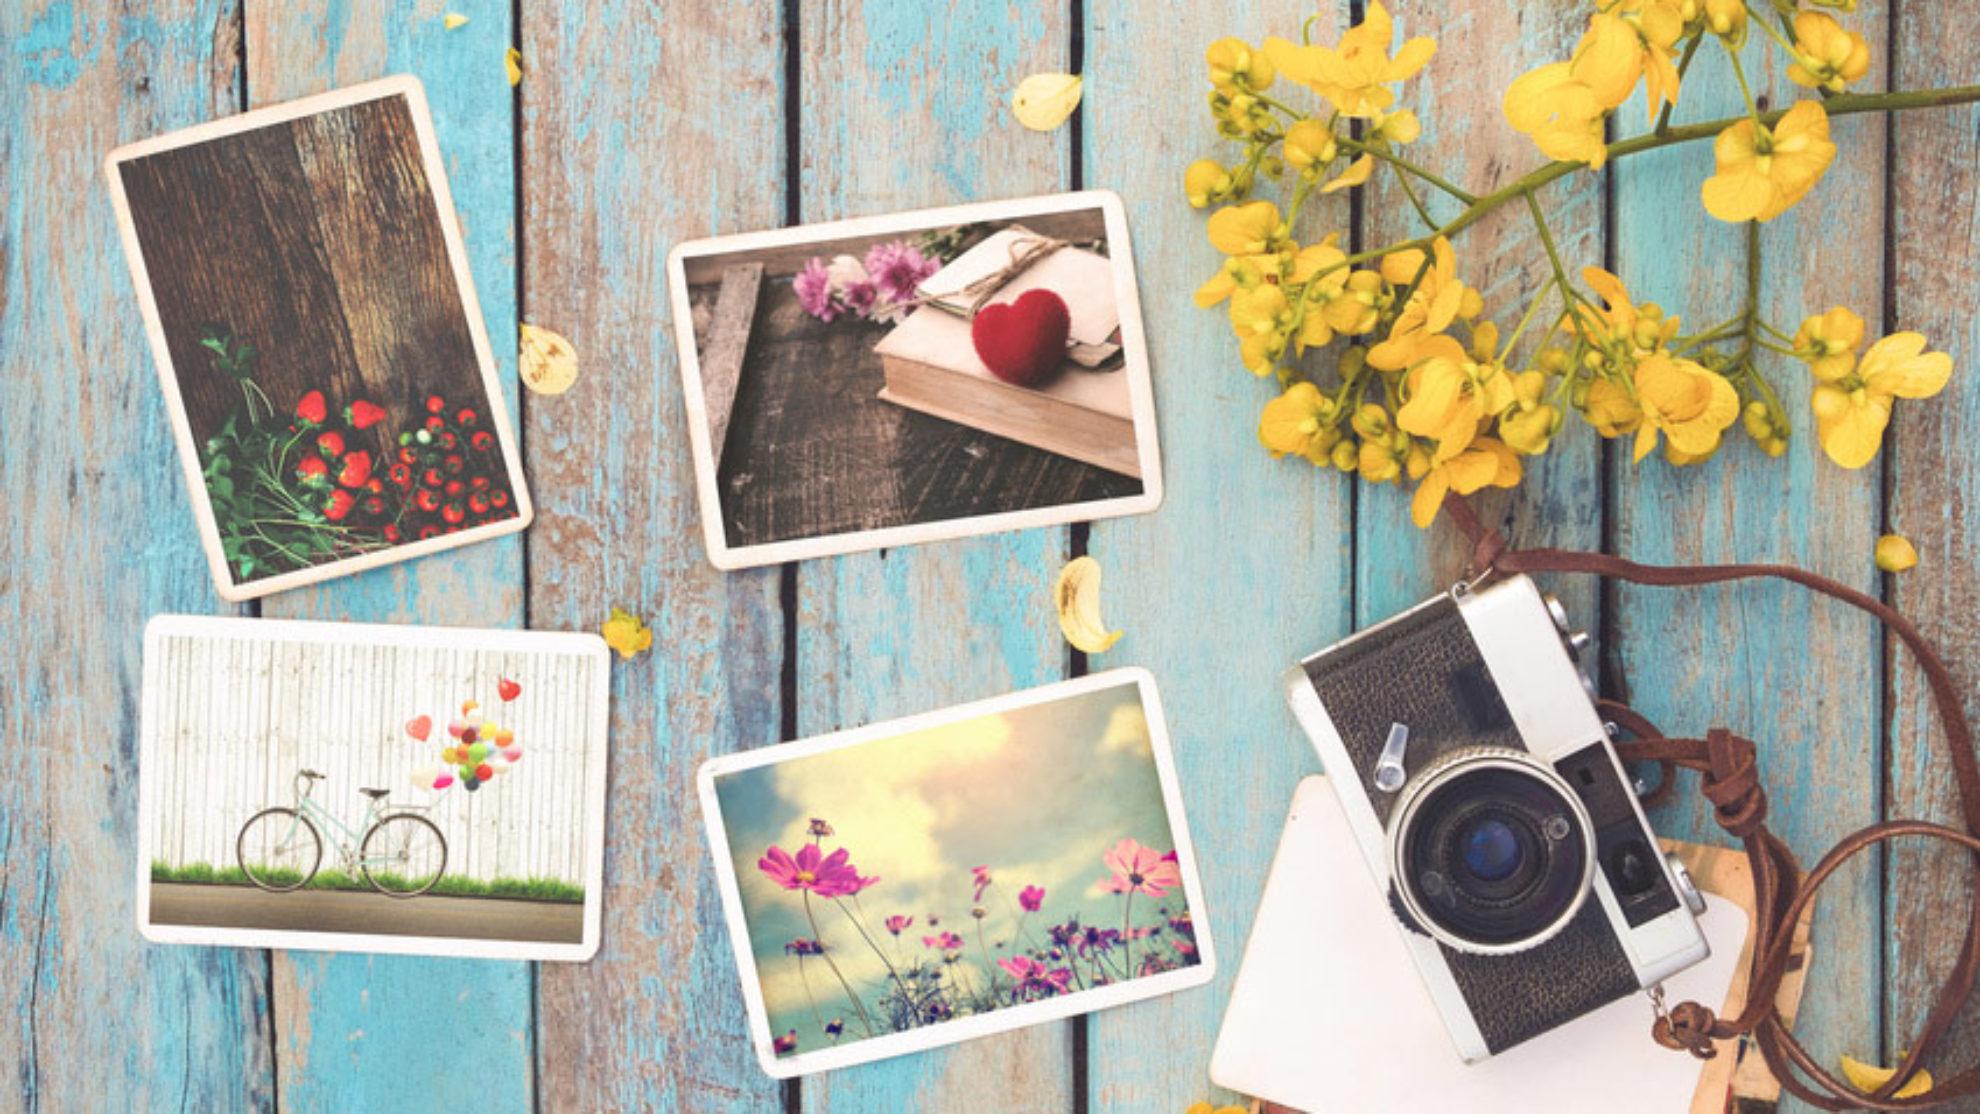 sofortbildkamera hochzeit polaroid kamera mieten. Black Bedroom Furniture Sets. Home Design Ideas